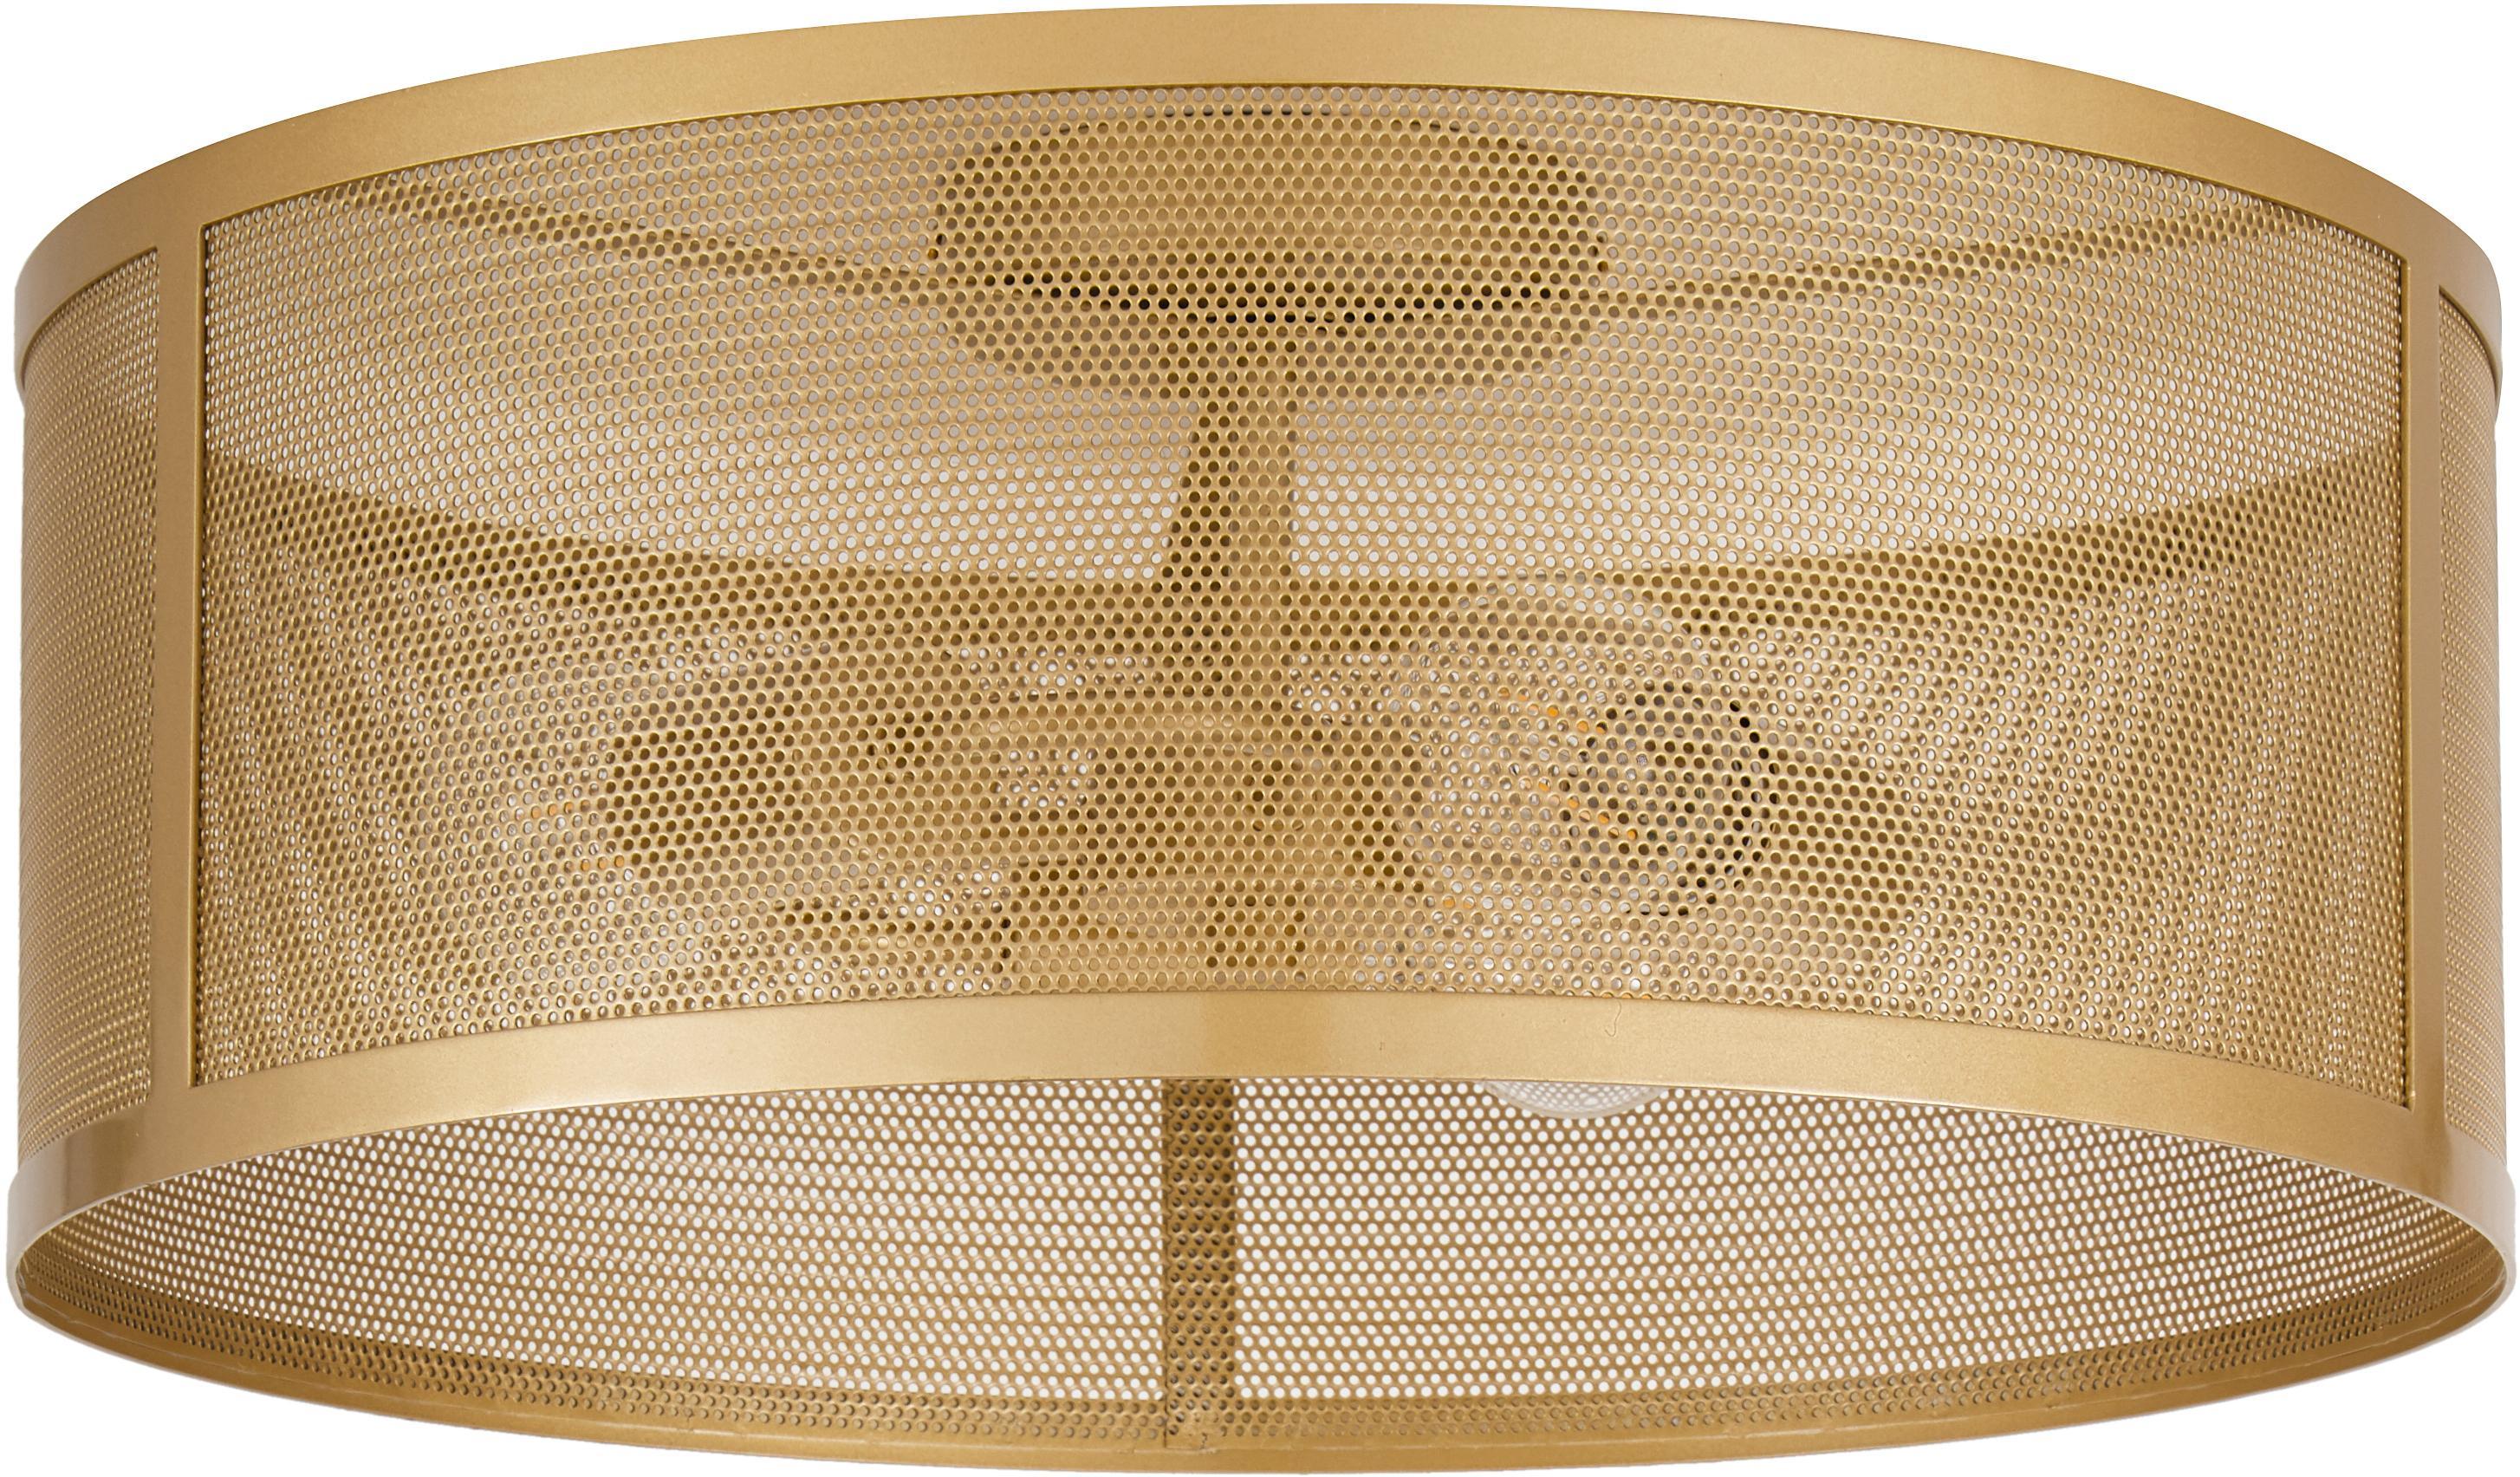 Plafondlamp Fishnet, Gecoat metaal, Goudkleurig, Ø 45 x H 21 cm